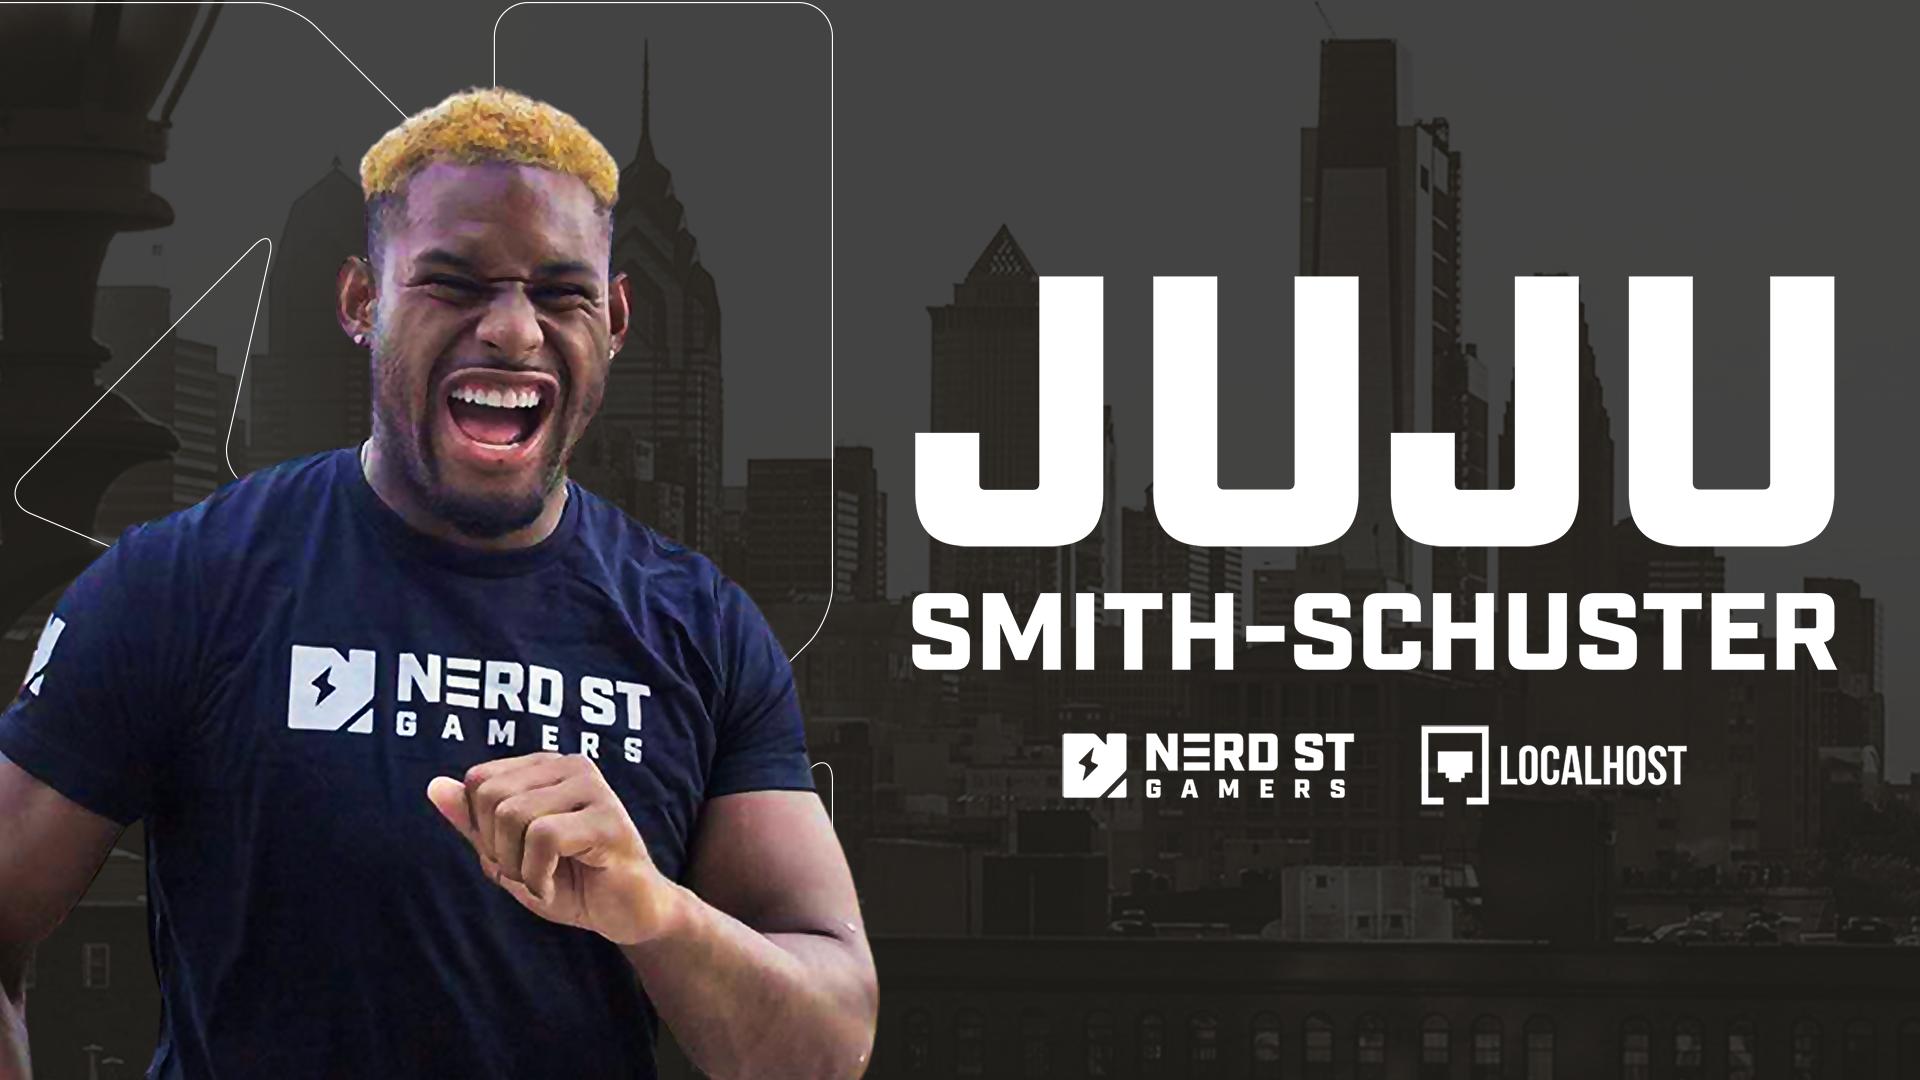 Pittsburgh Steelers wide receiver JuJu Smith-Schuster in Nerd Street shirt